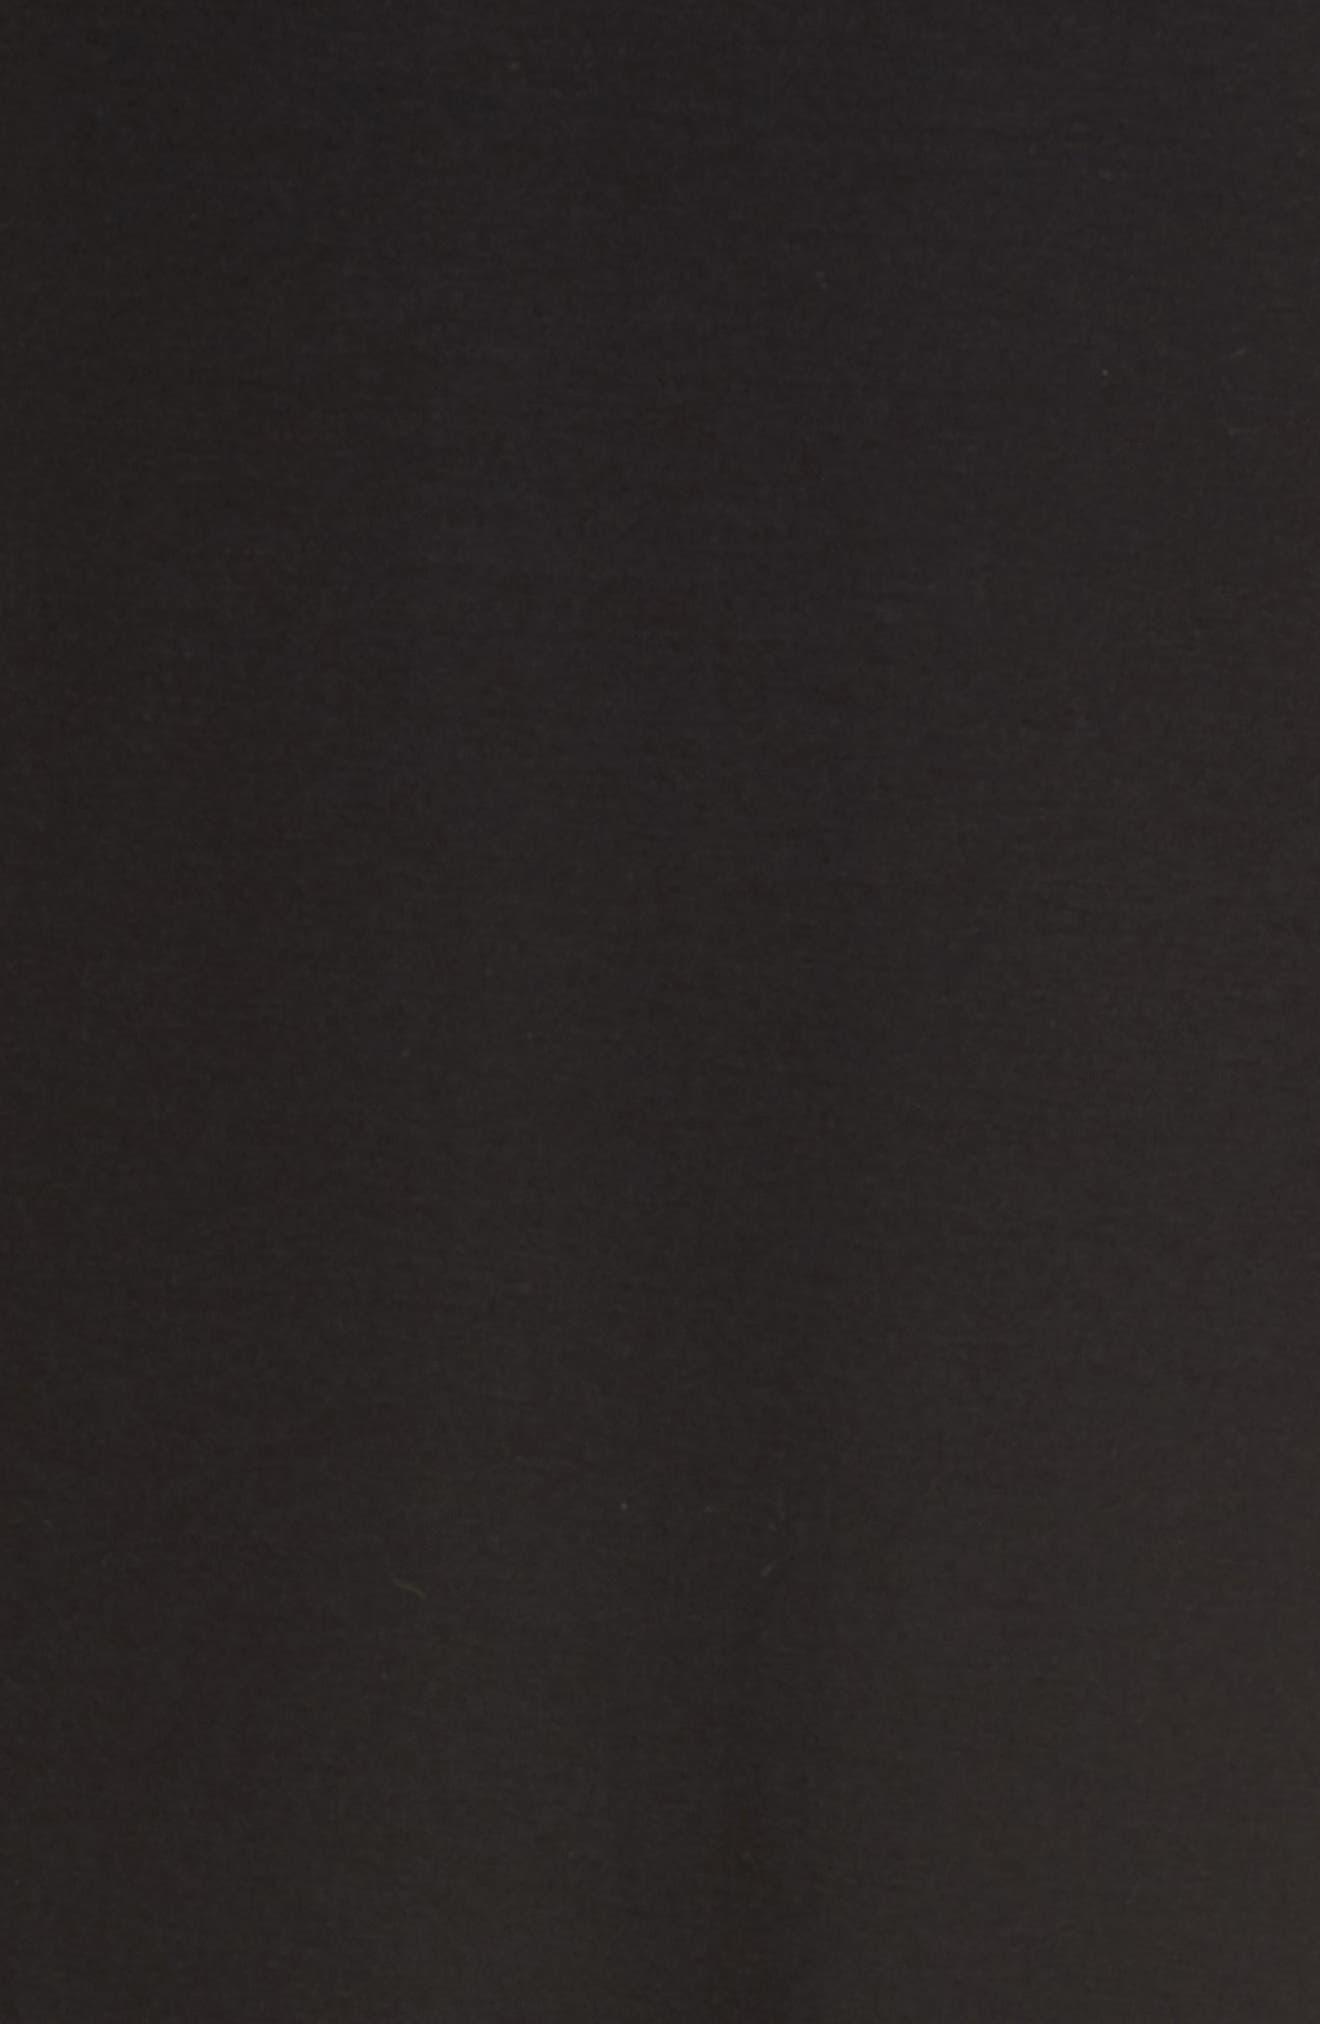 Jersey Shift Dress,                             Alternate thumbnail 5, color,                             Black